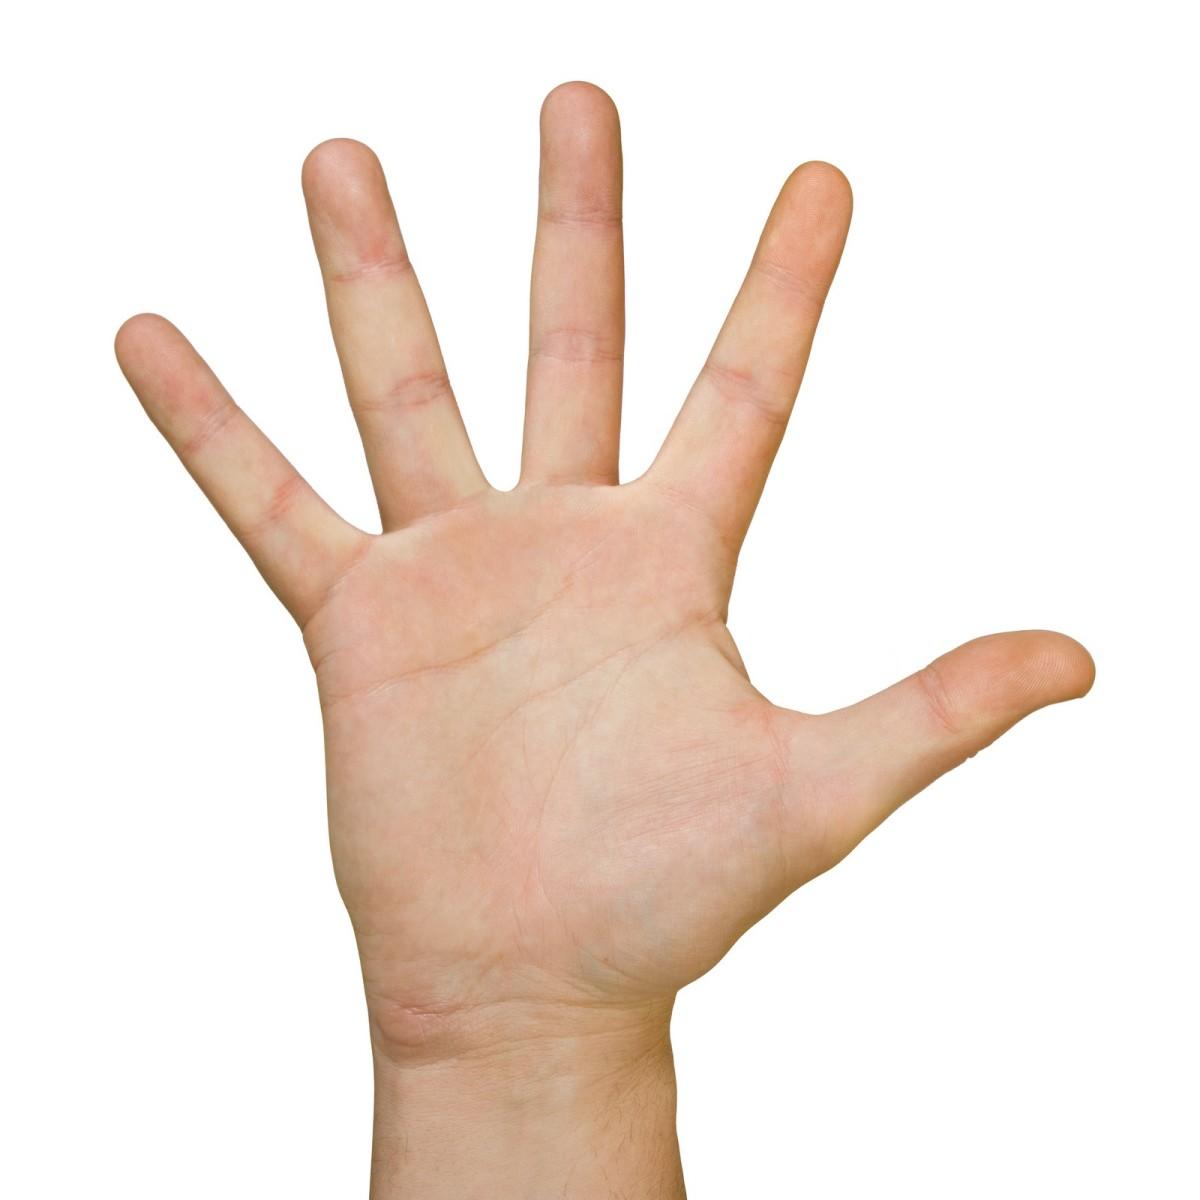 The Rigid Hand